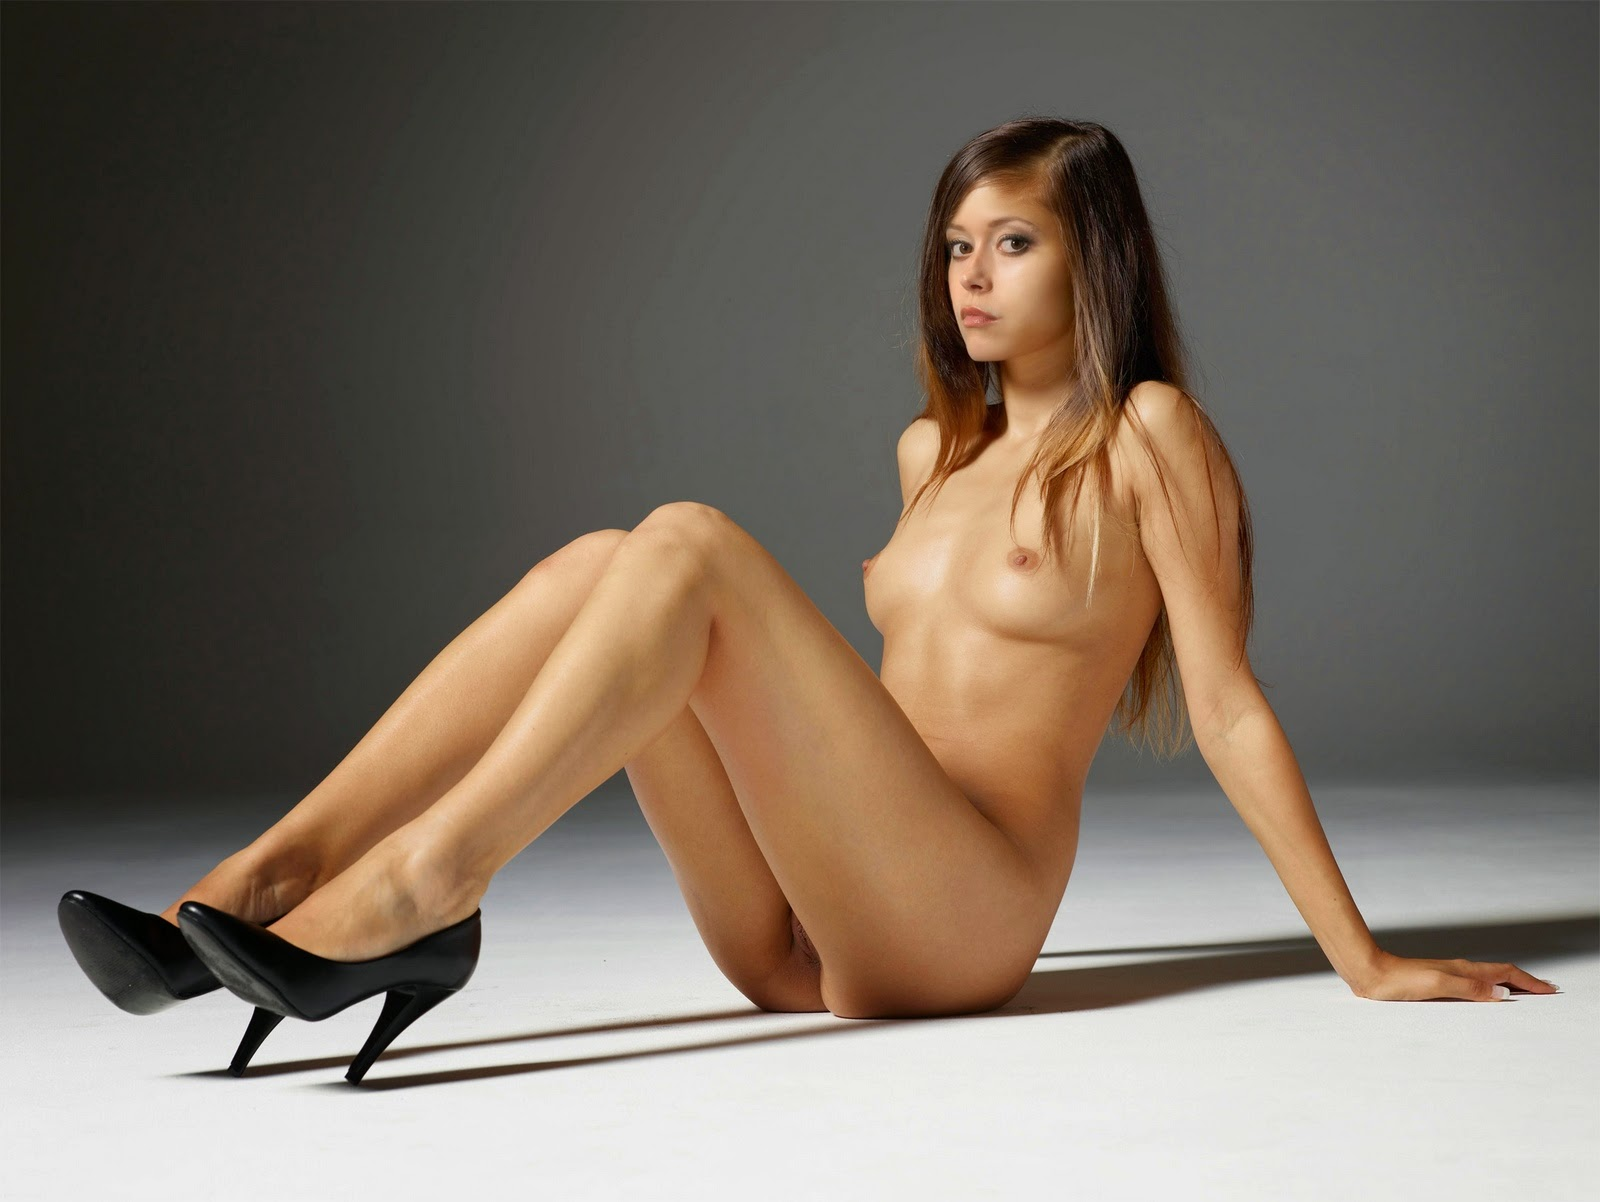 Summer glau naked